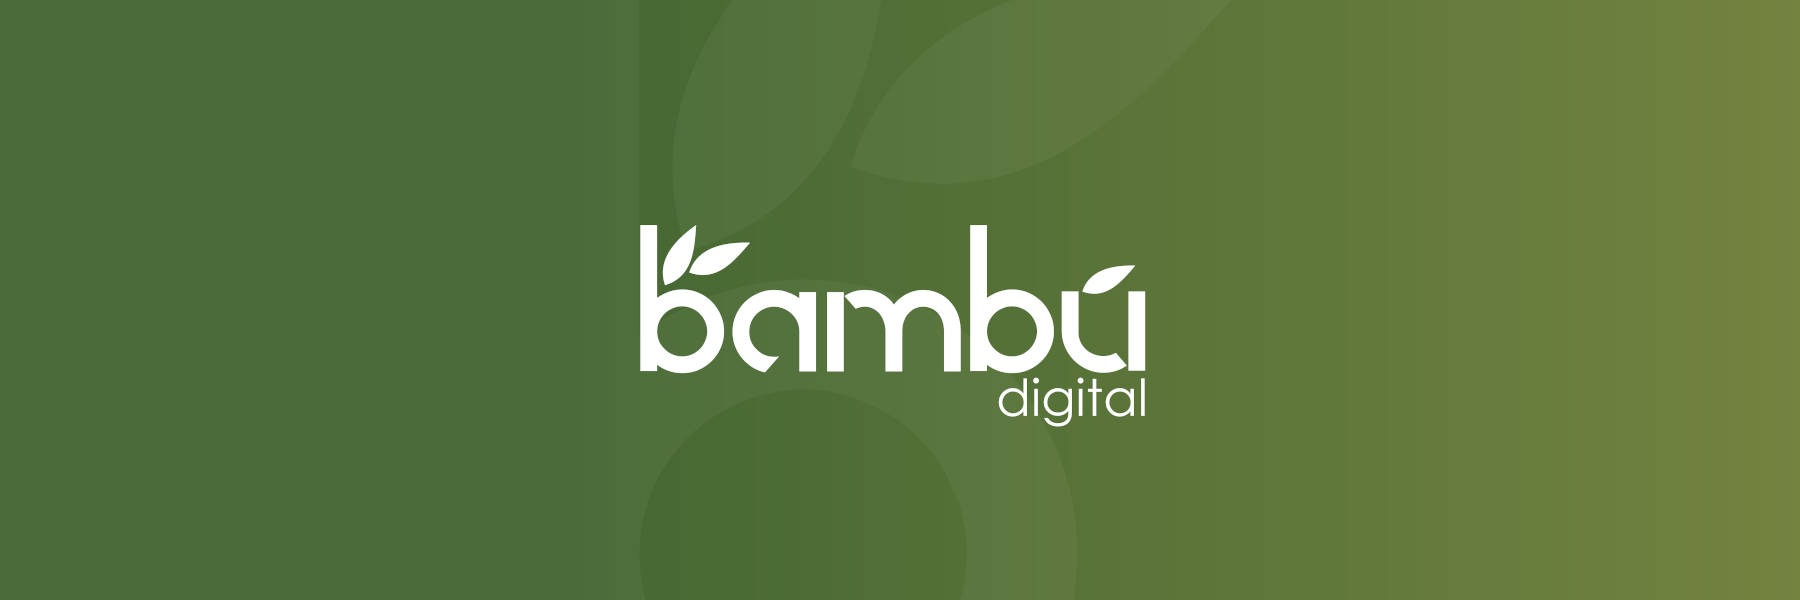 Bambu-branding_header